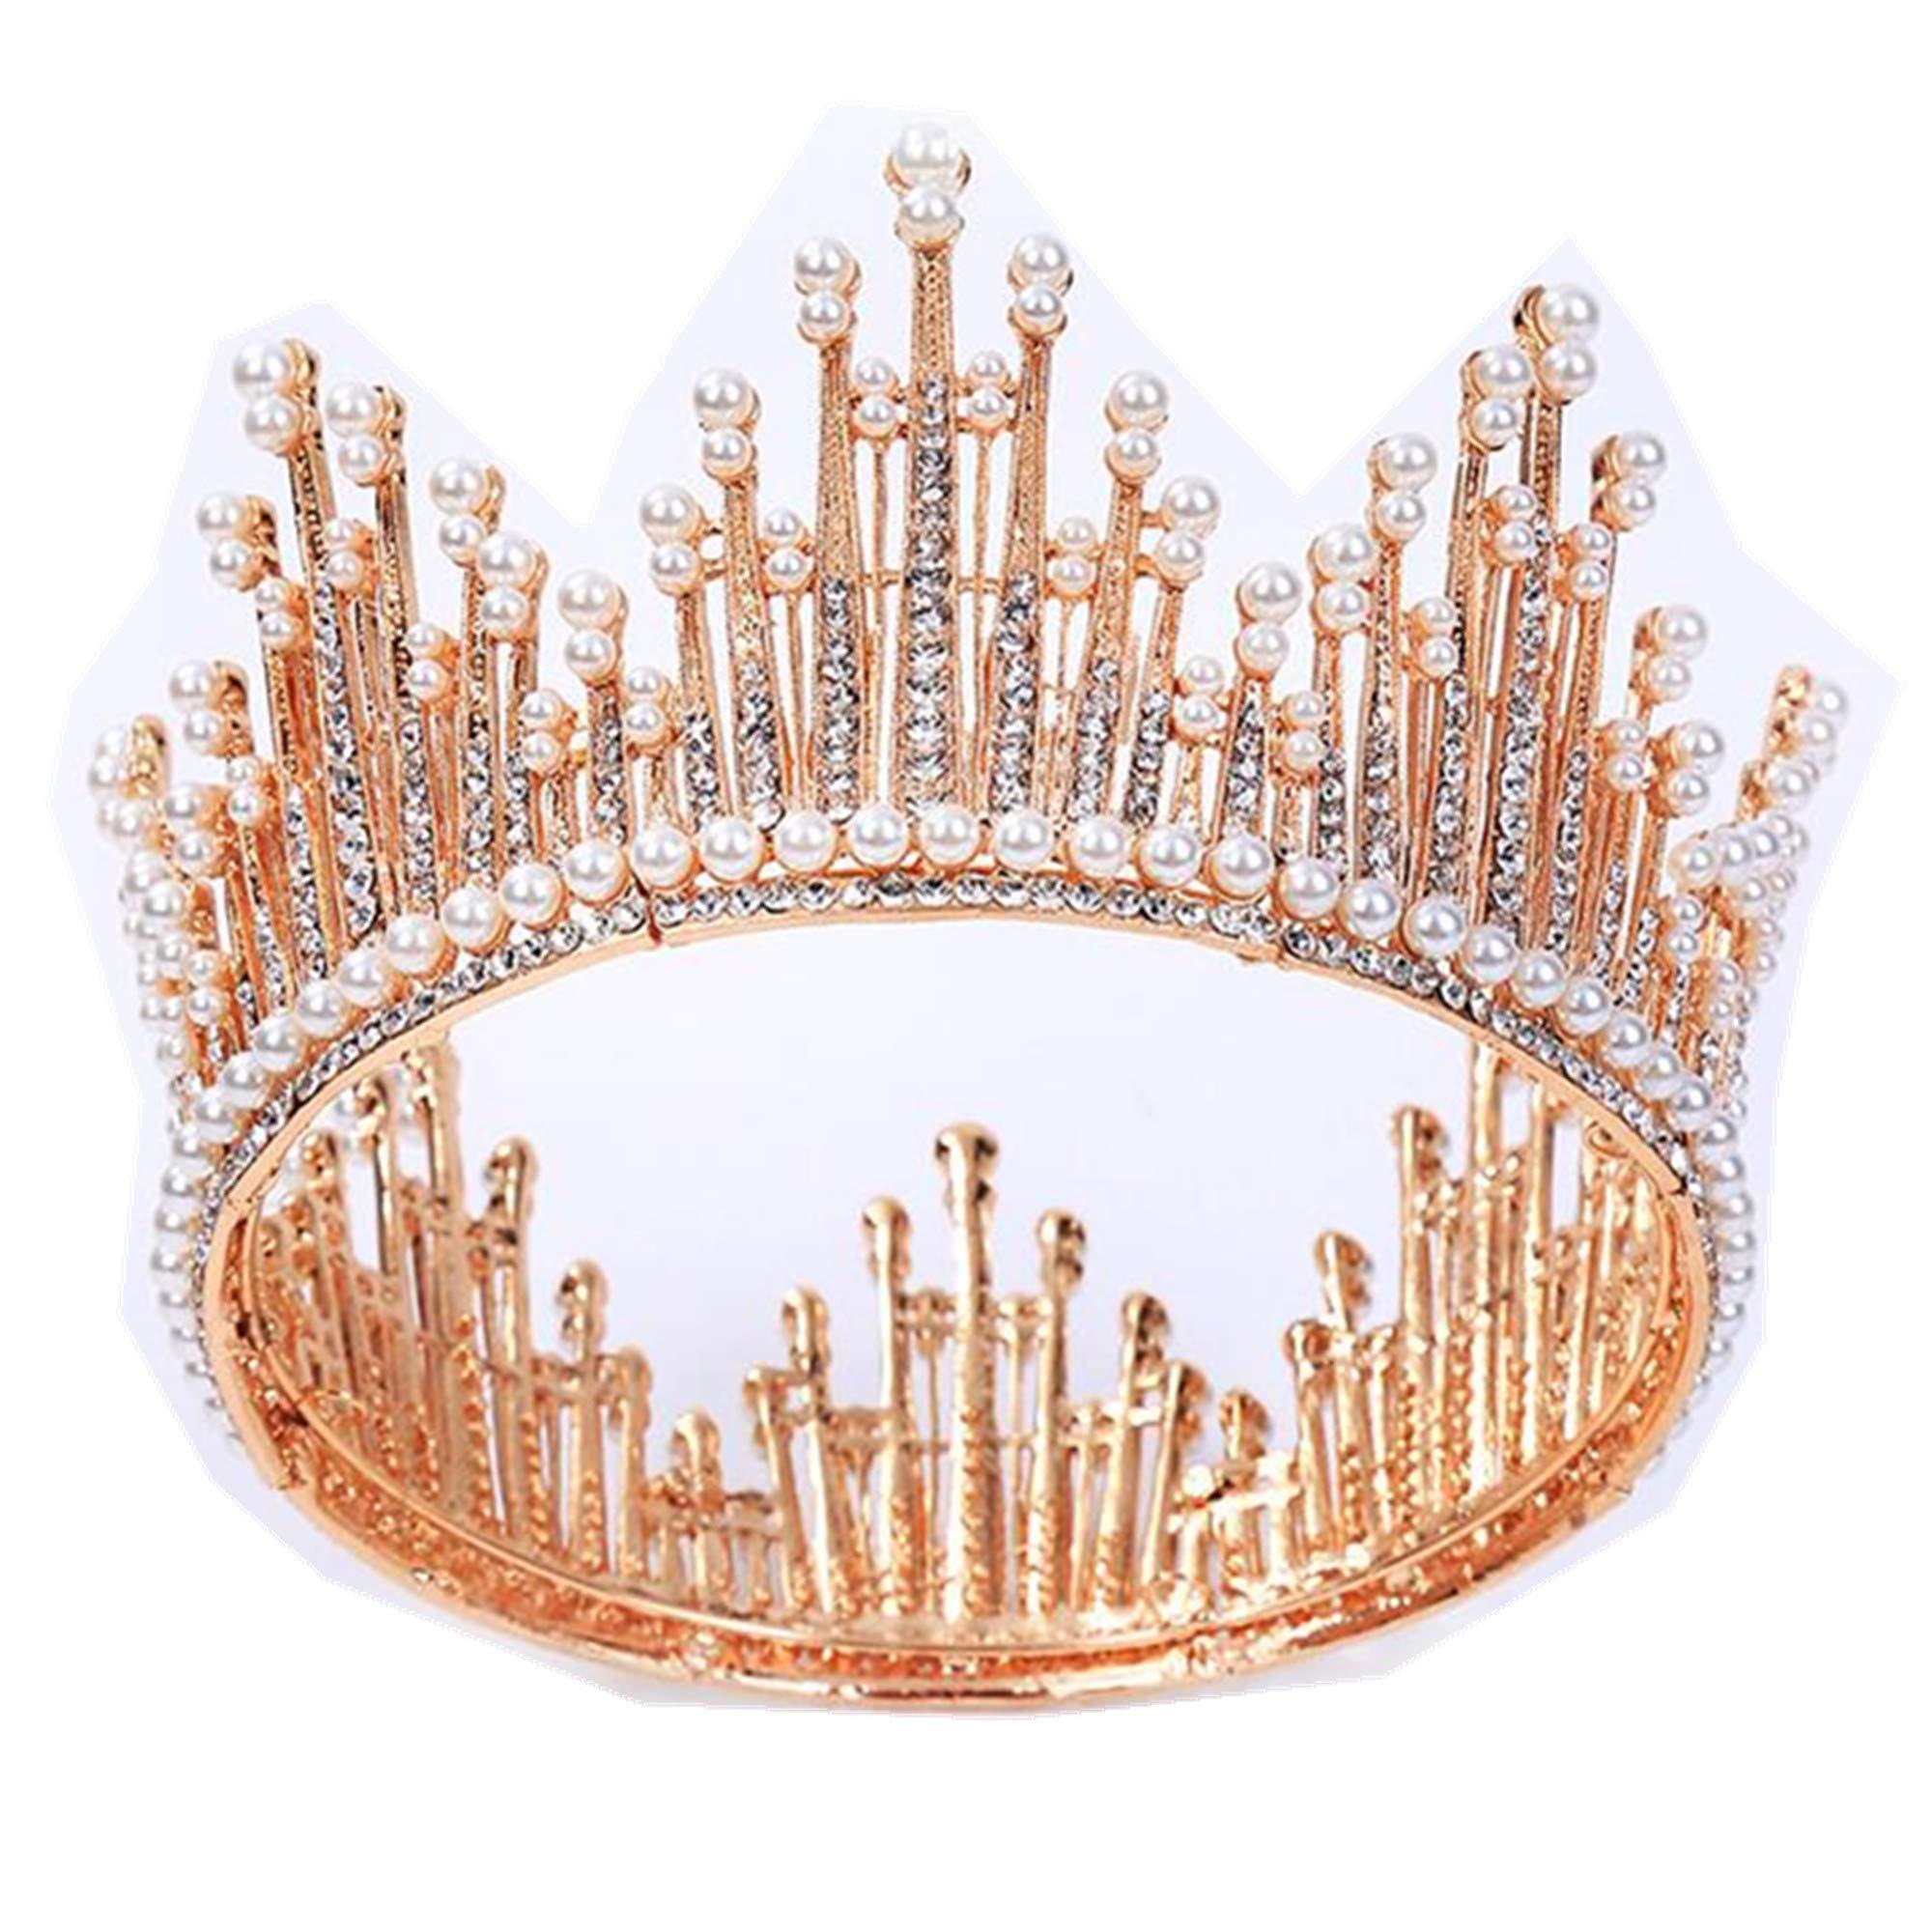 Wiipu Round Bridal Circle Faux Pearl Rhinestone Crown Tiara,5.9'' Diameter(A1351) (rose gold)